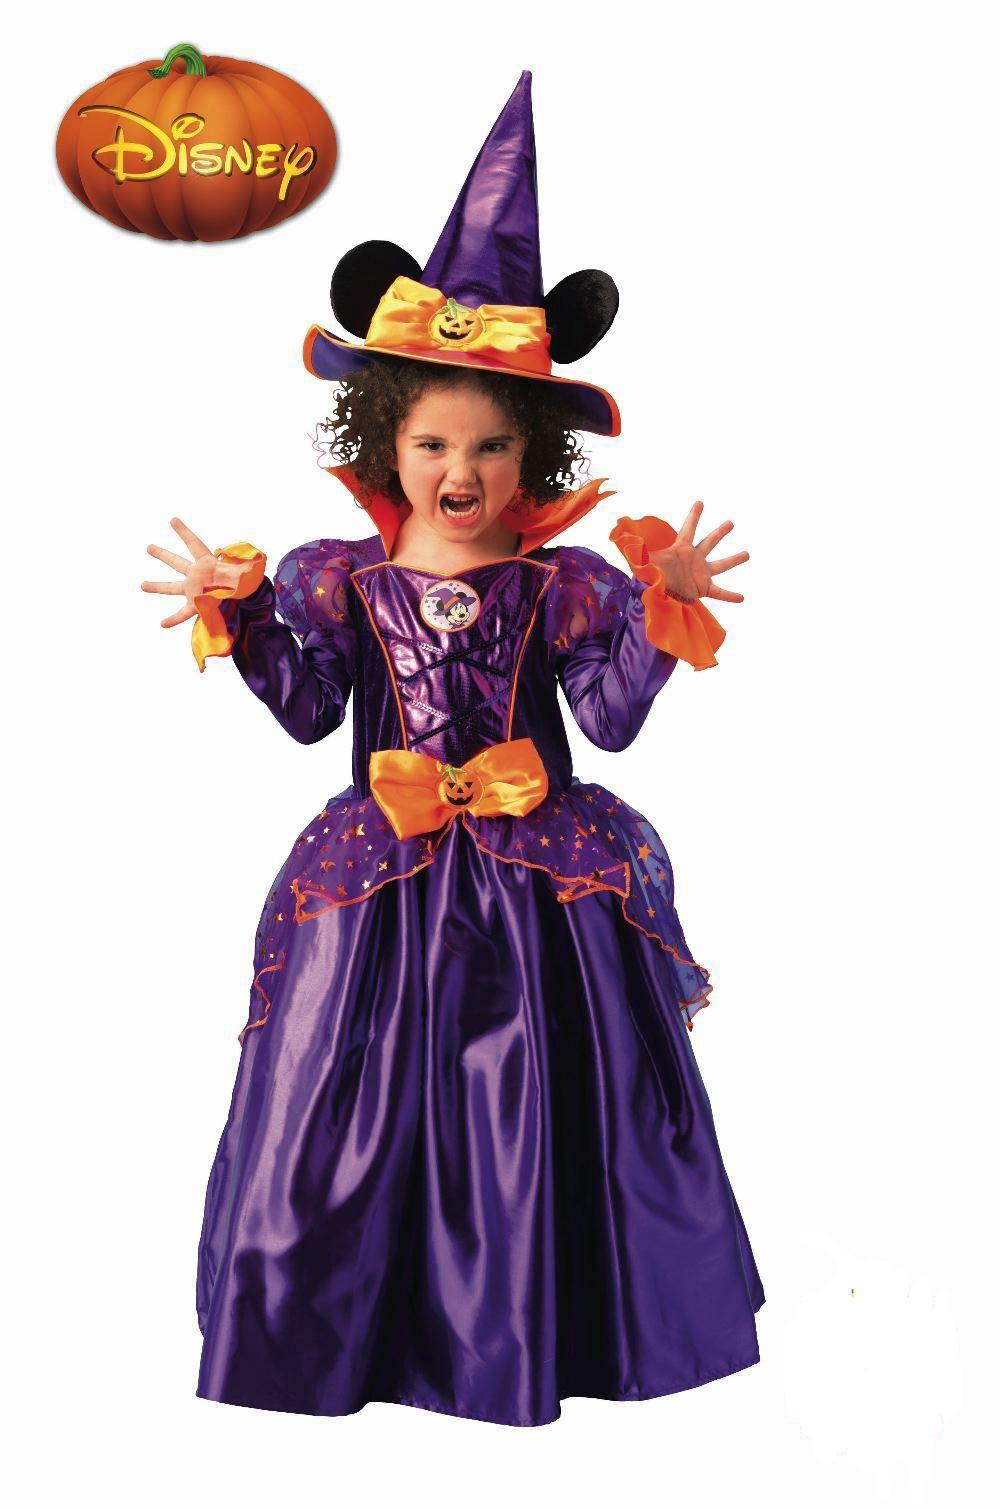 Disfraz niña Bruja Minnie Mouse Disfraz niña bruja Minnie